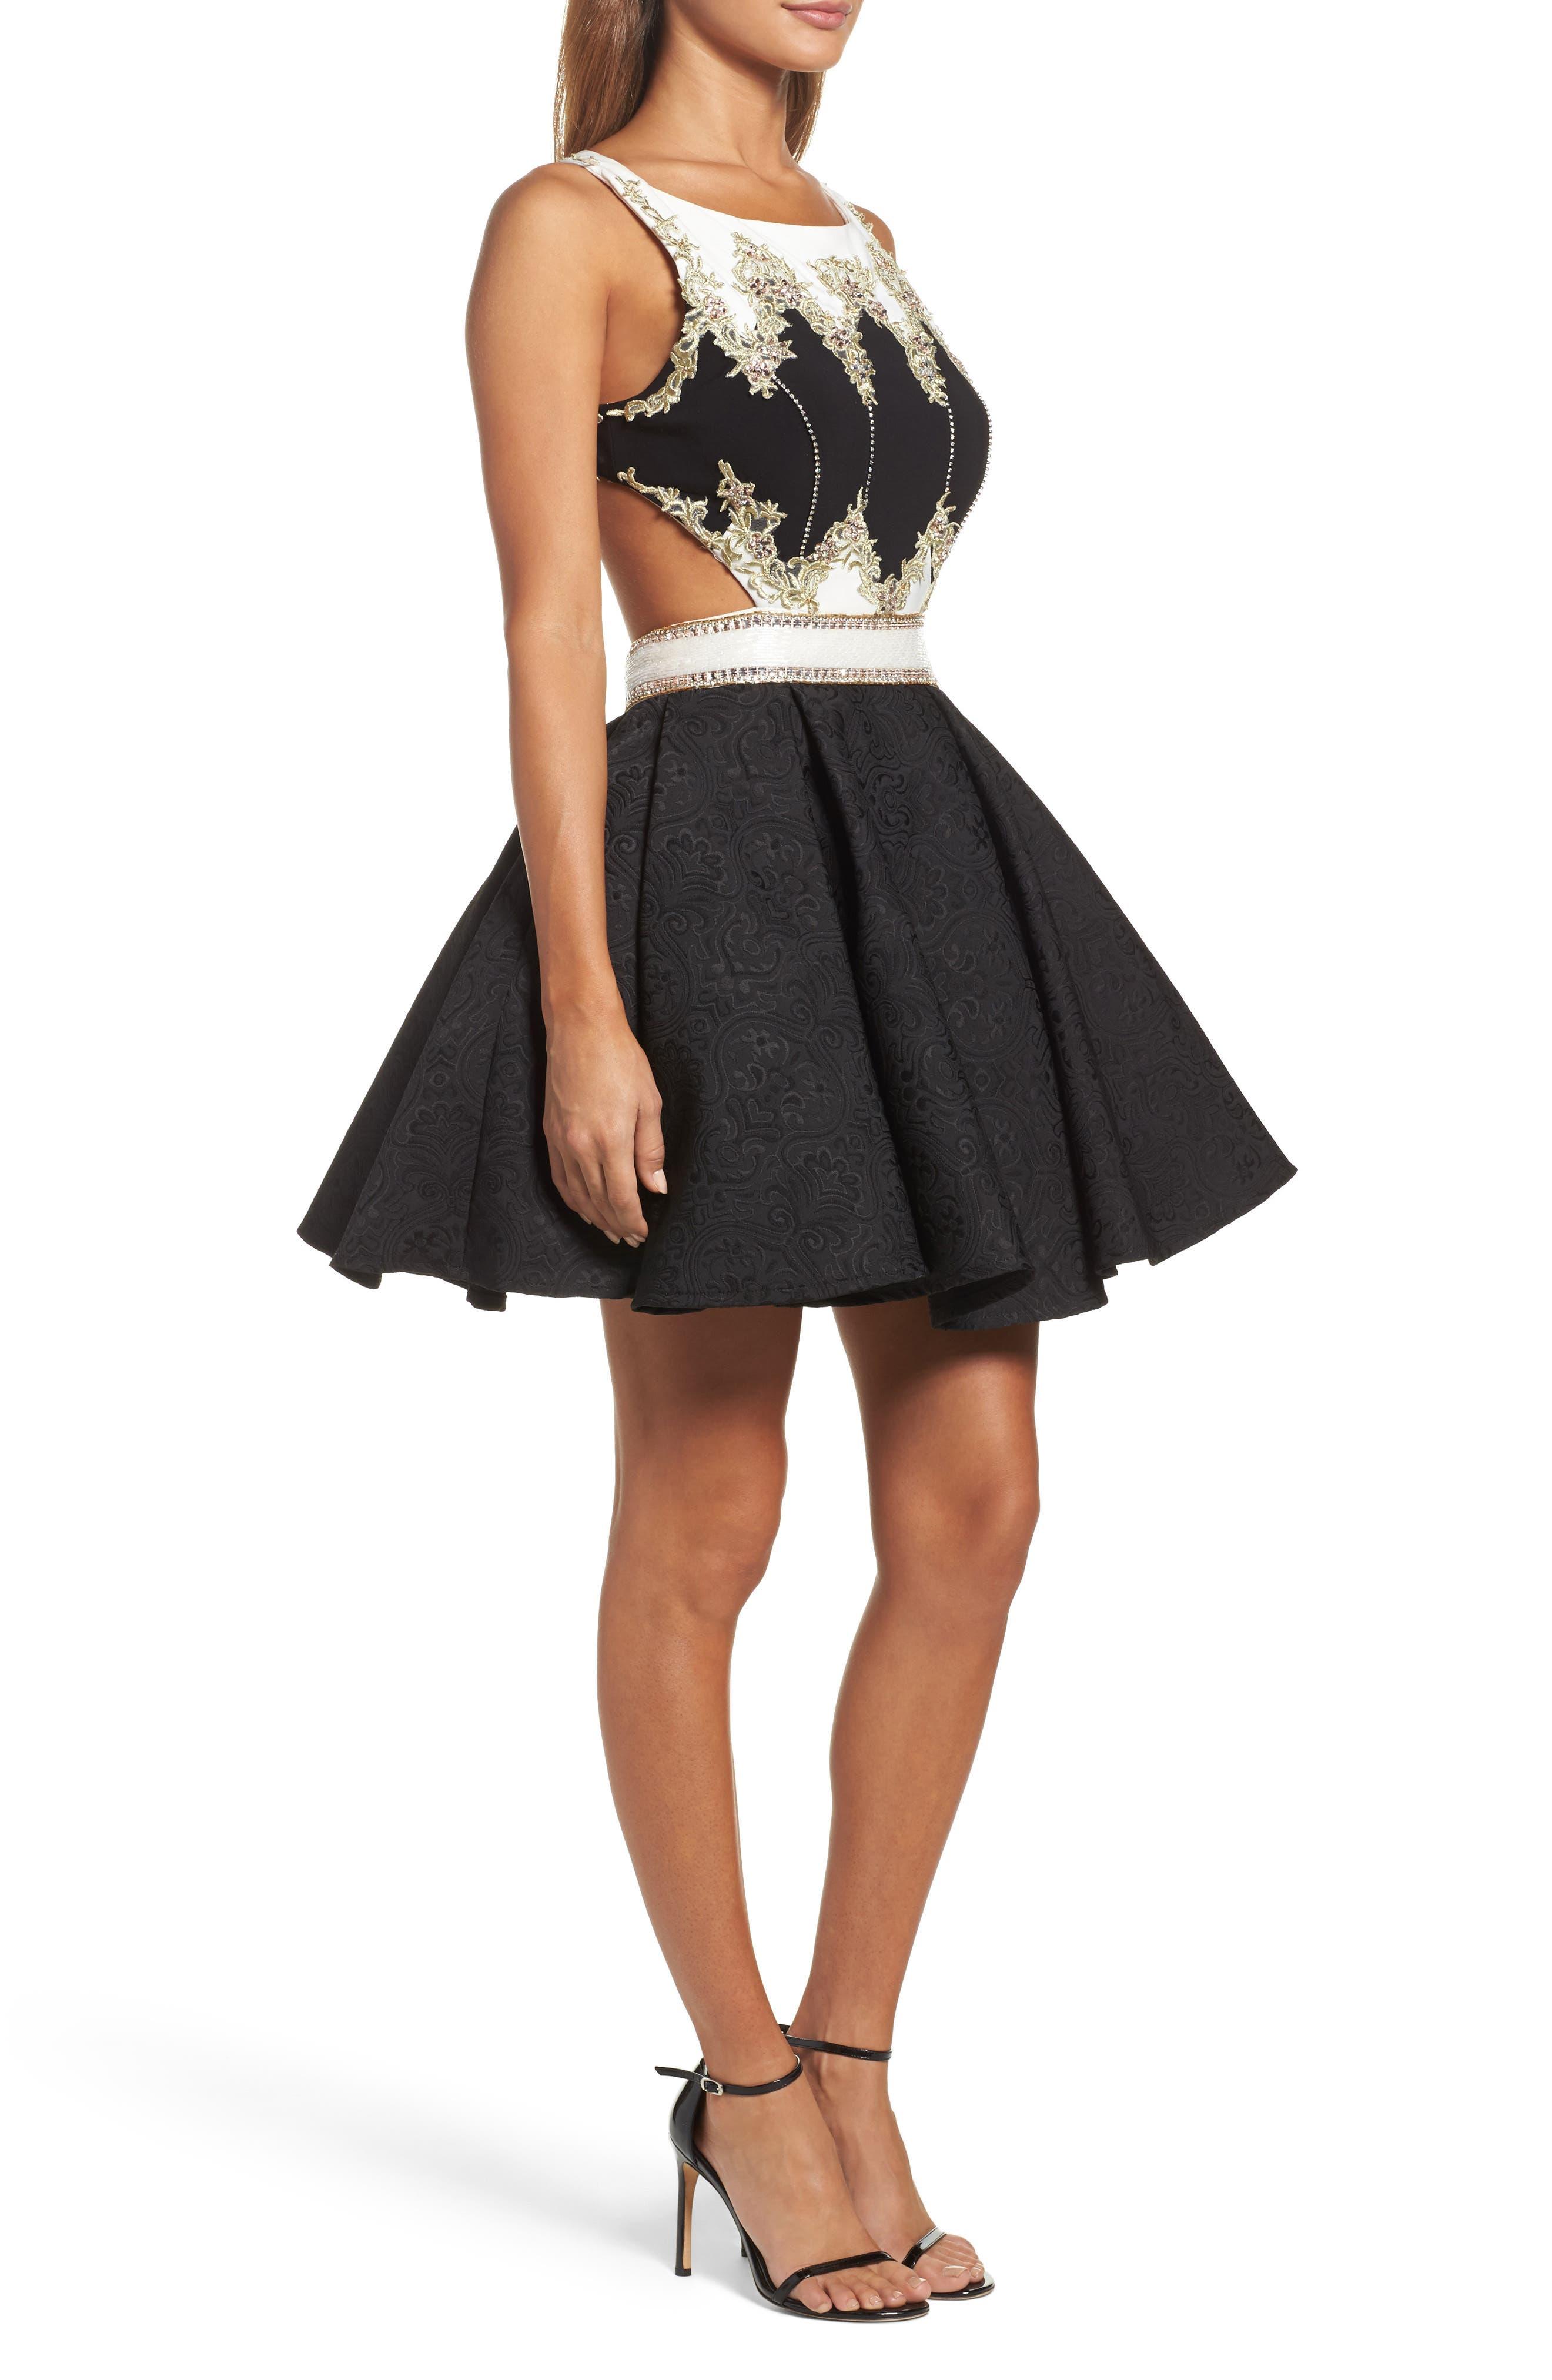 Embellished Cutout Back Cocktail Dress,                             Alternate thumbnail 3, color,                             Black Ivory